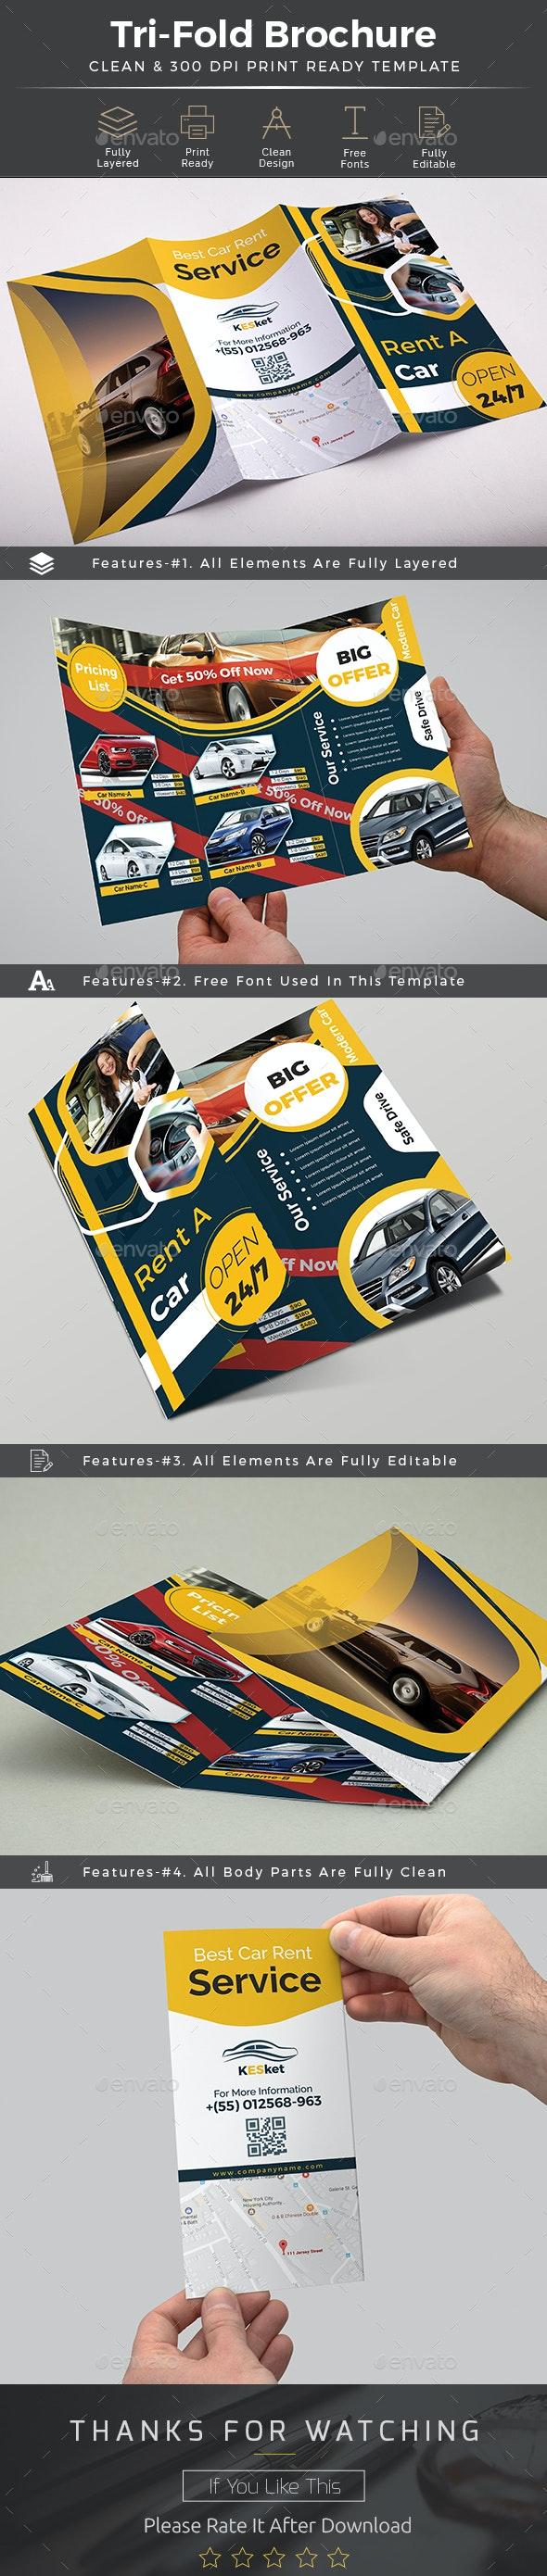 Rent a Car Trifold Brochure Template - Brochures Print Templates